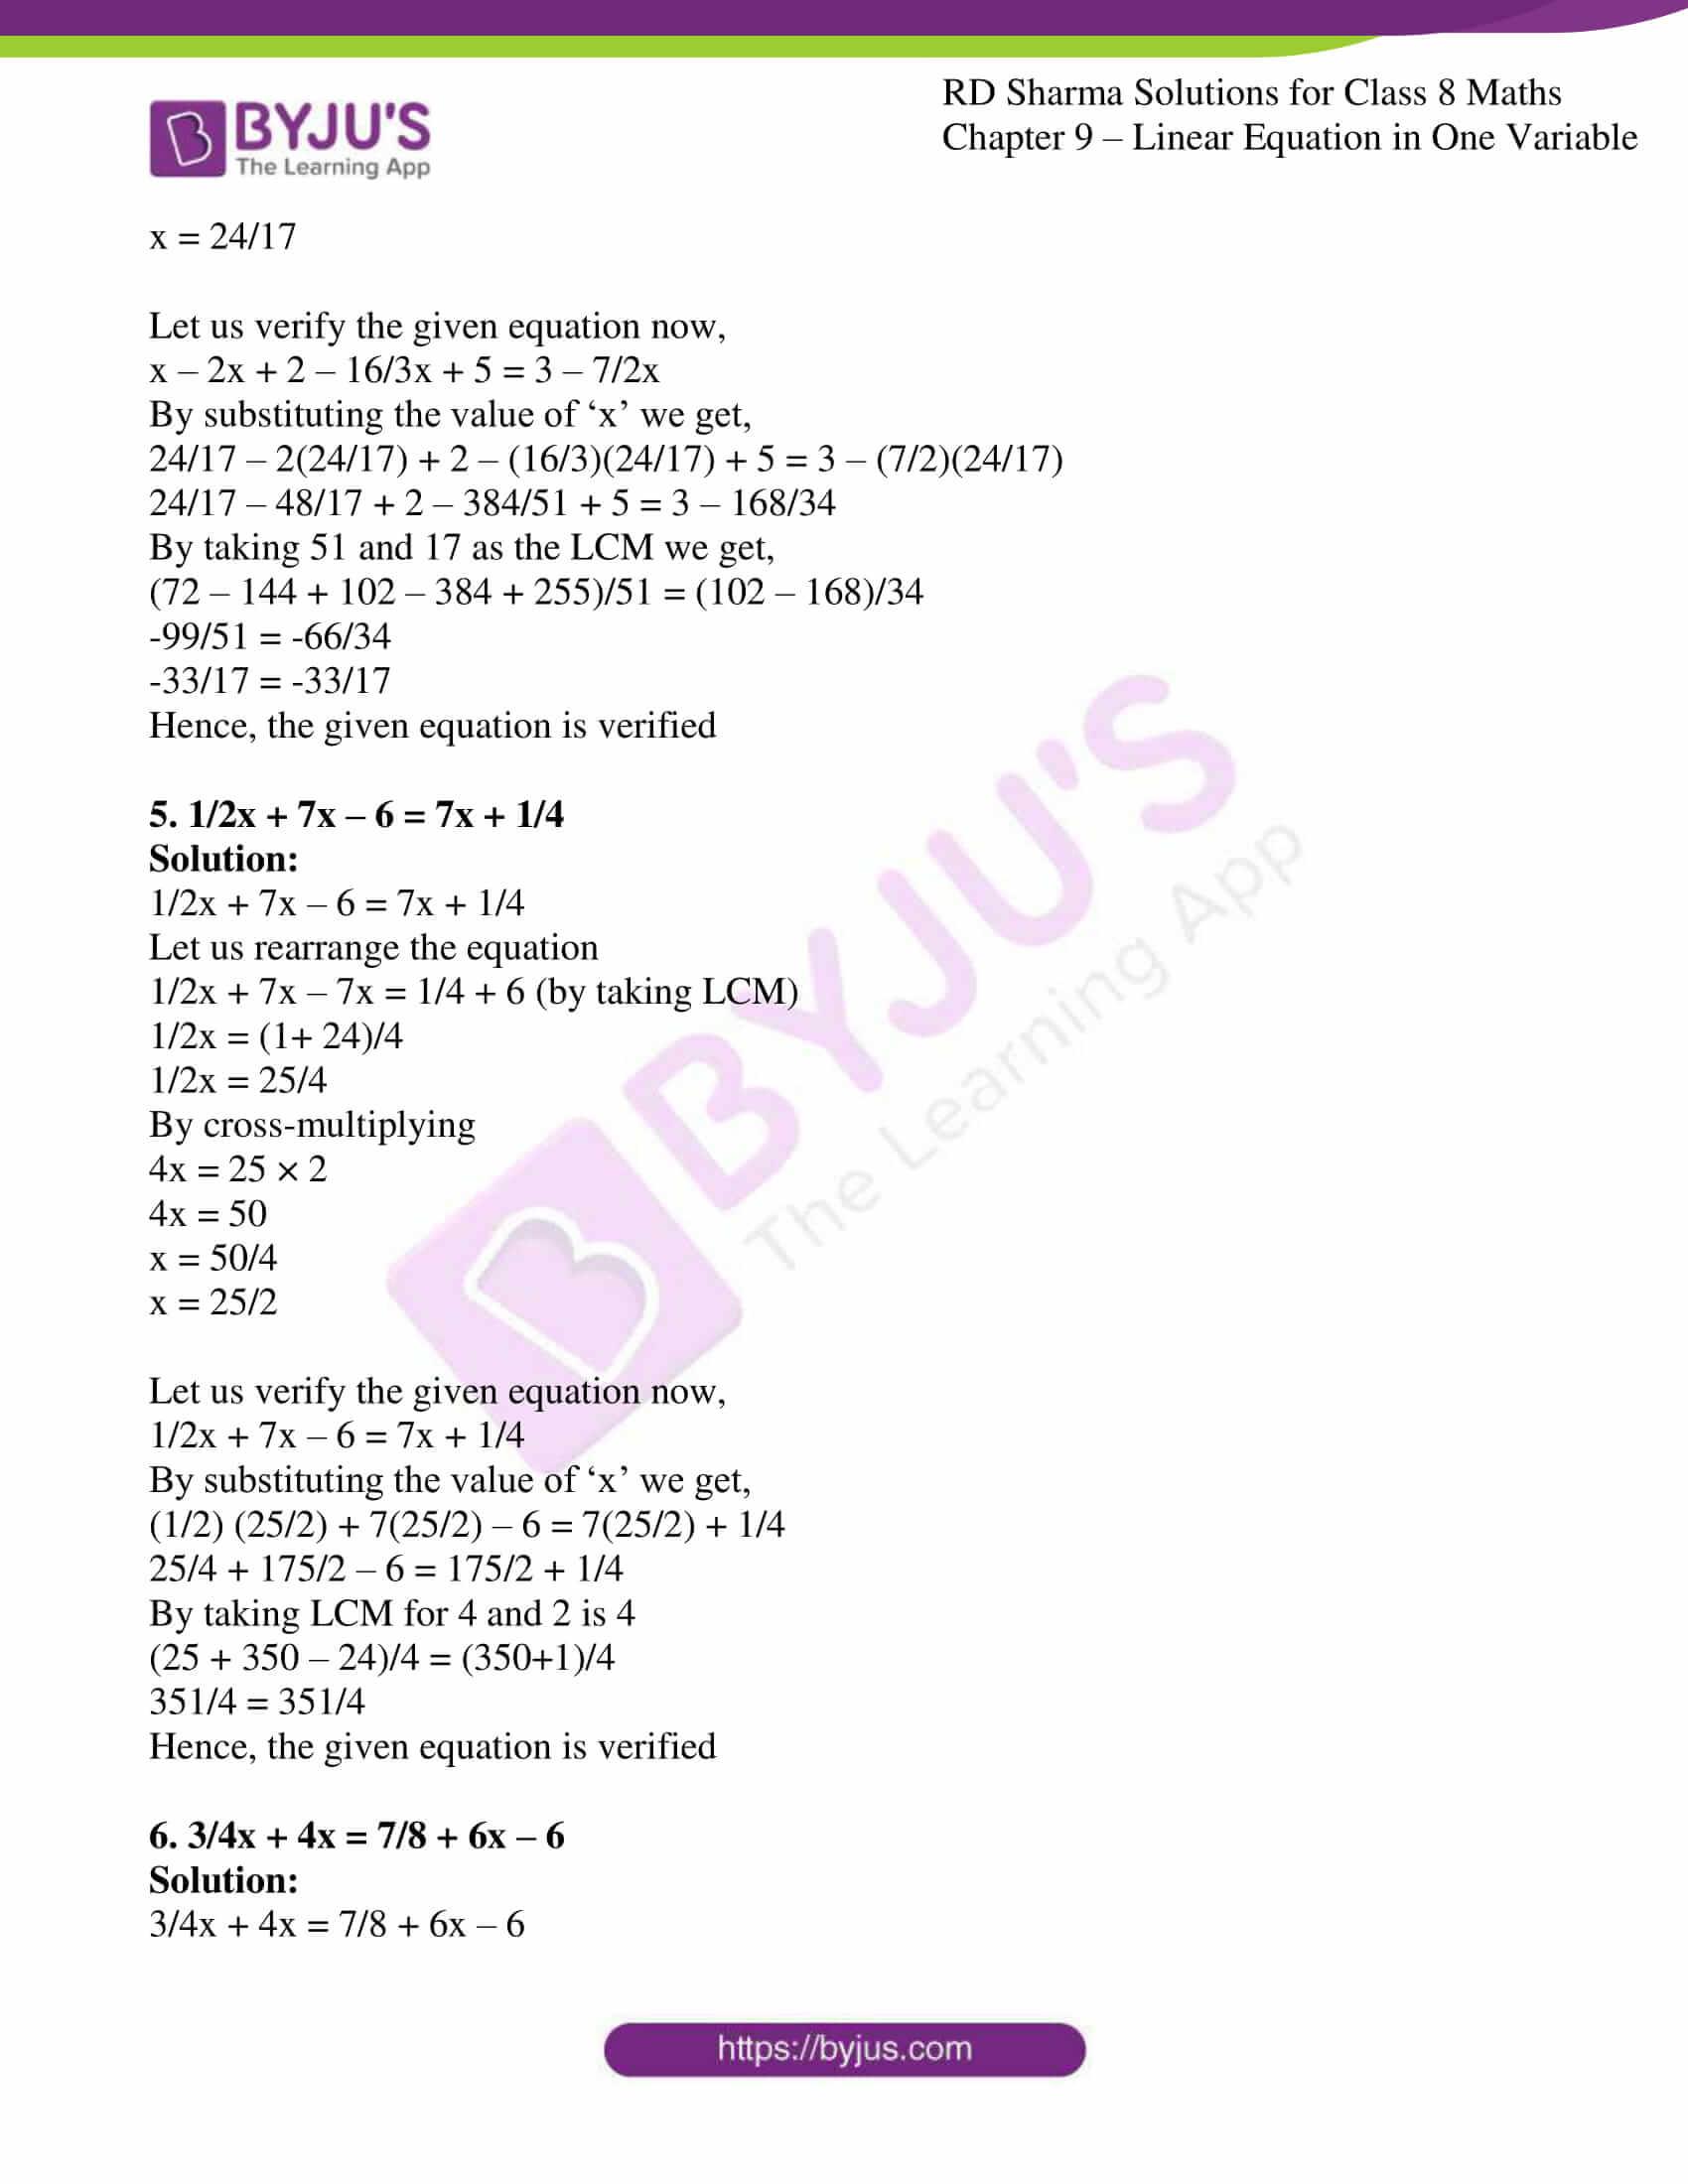 rd sharma class 8 maths chapter 9 exercise 2 03